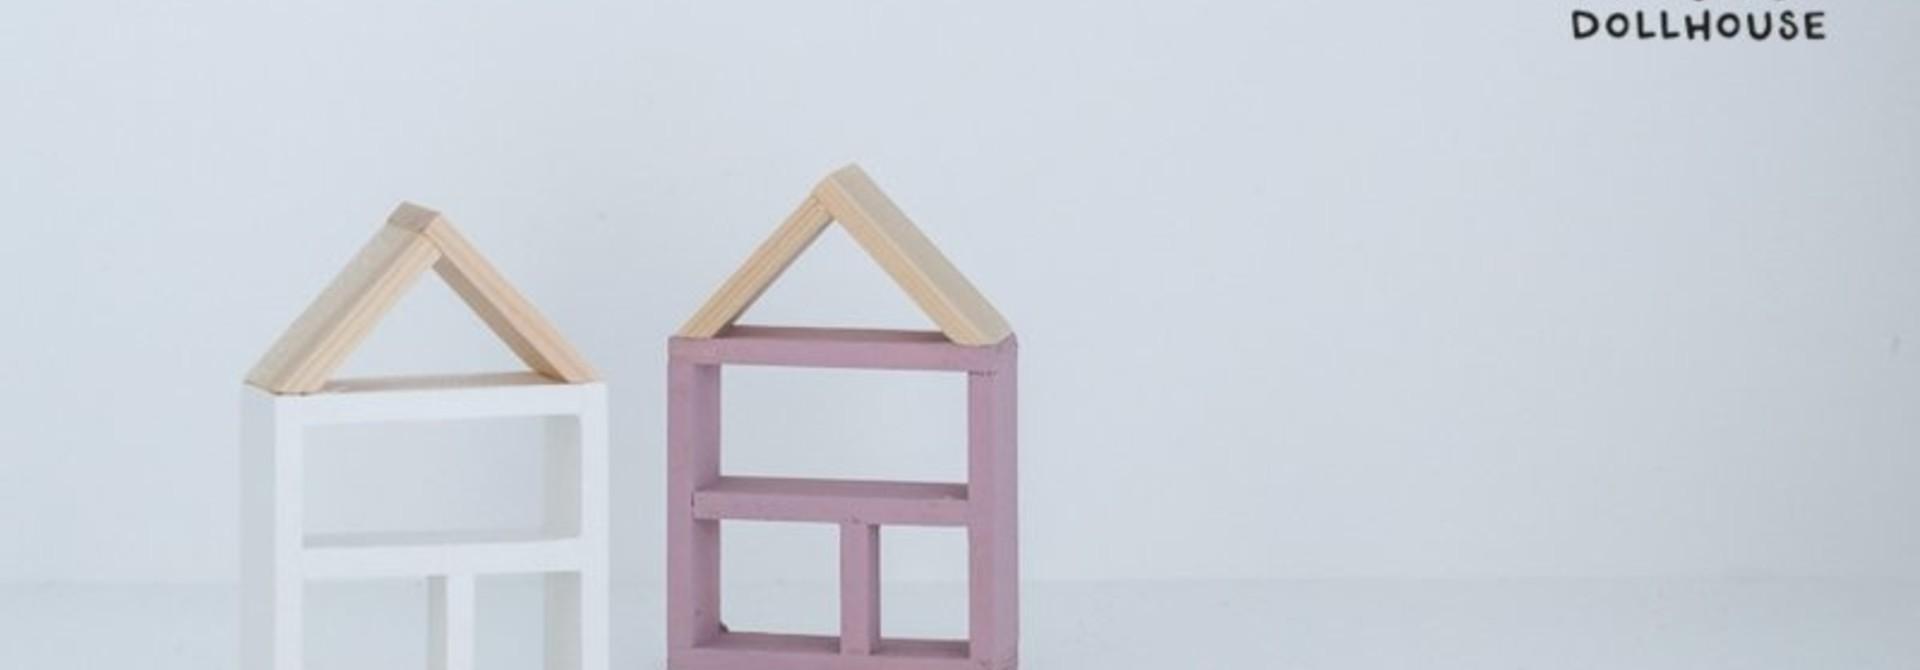 Dollhouse Minthe Mini